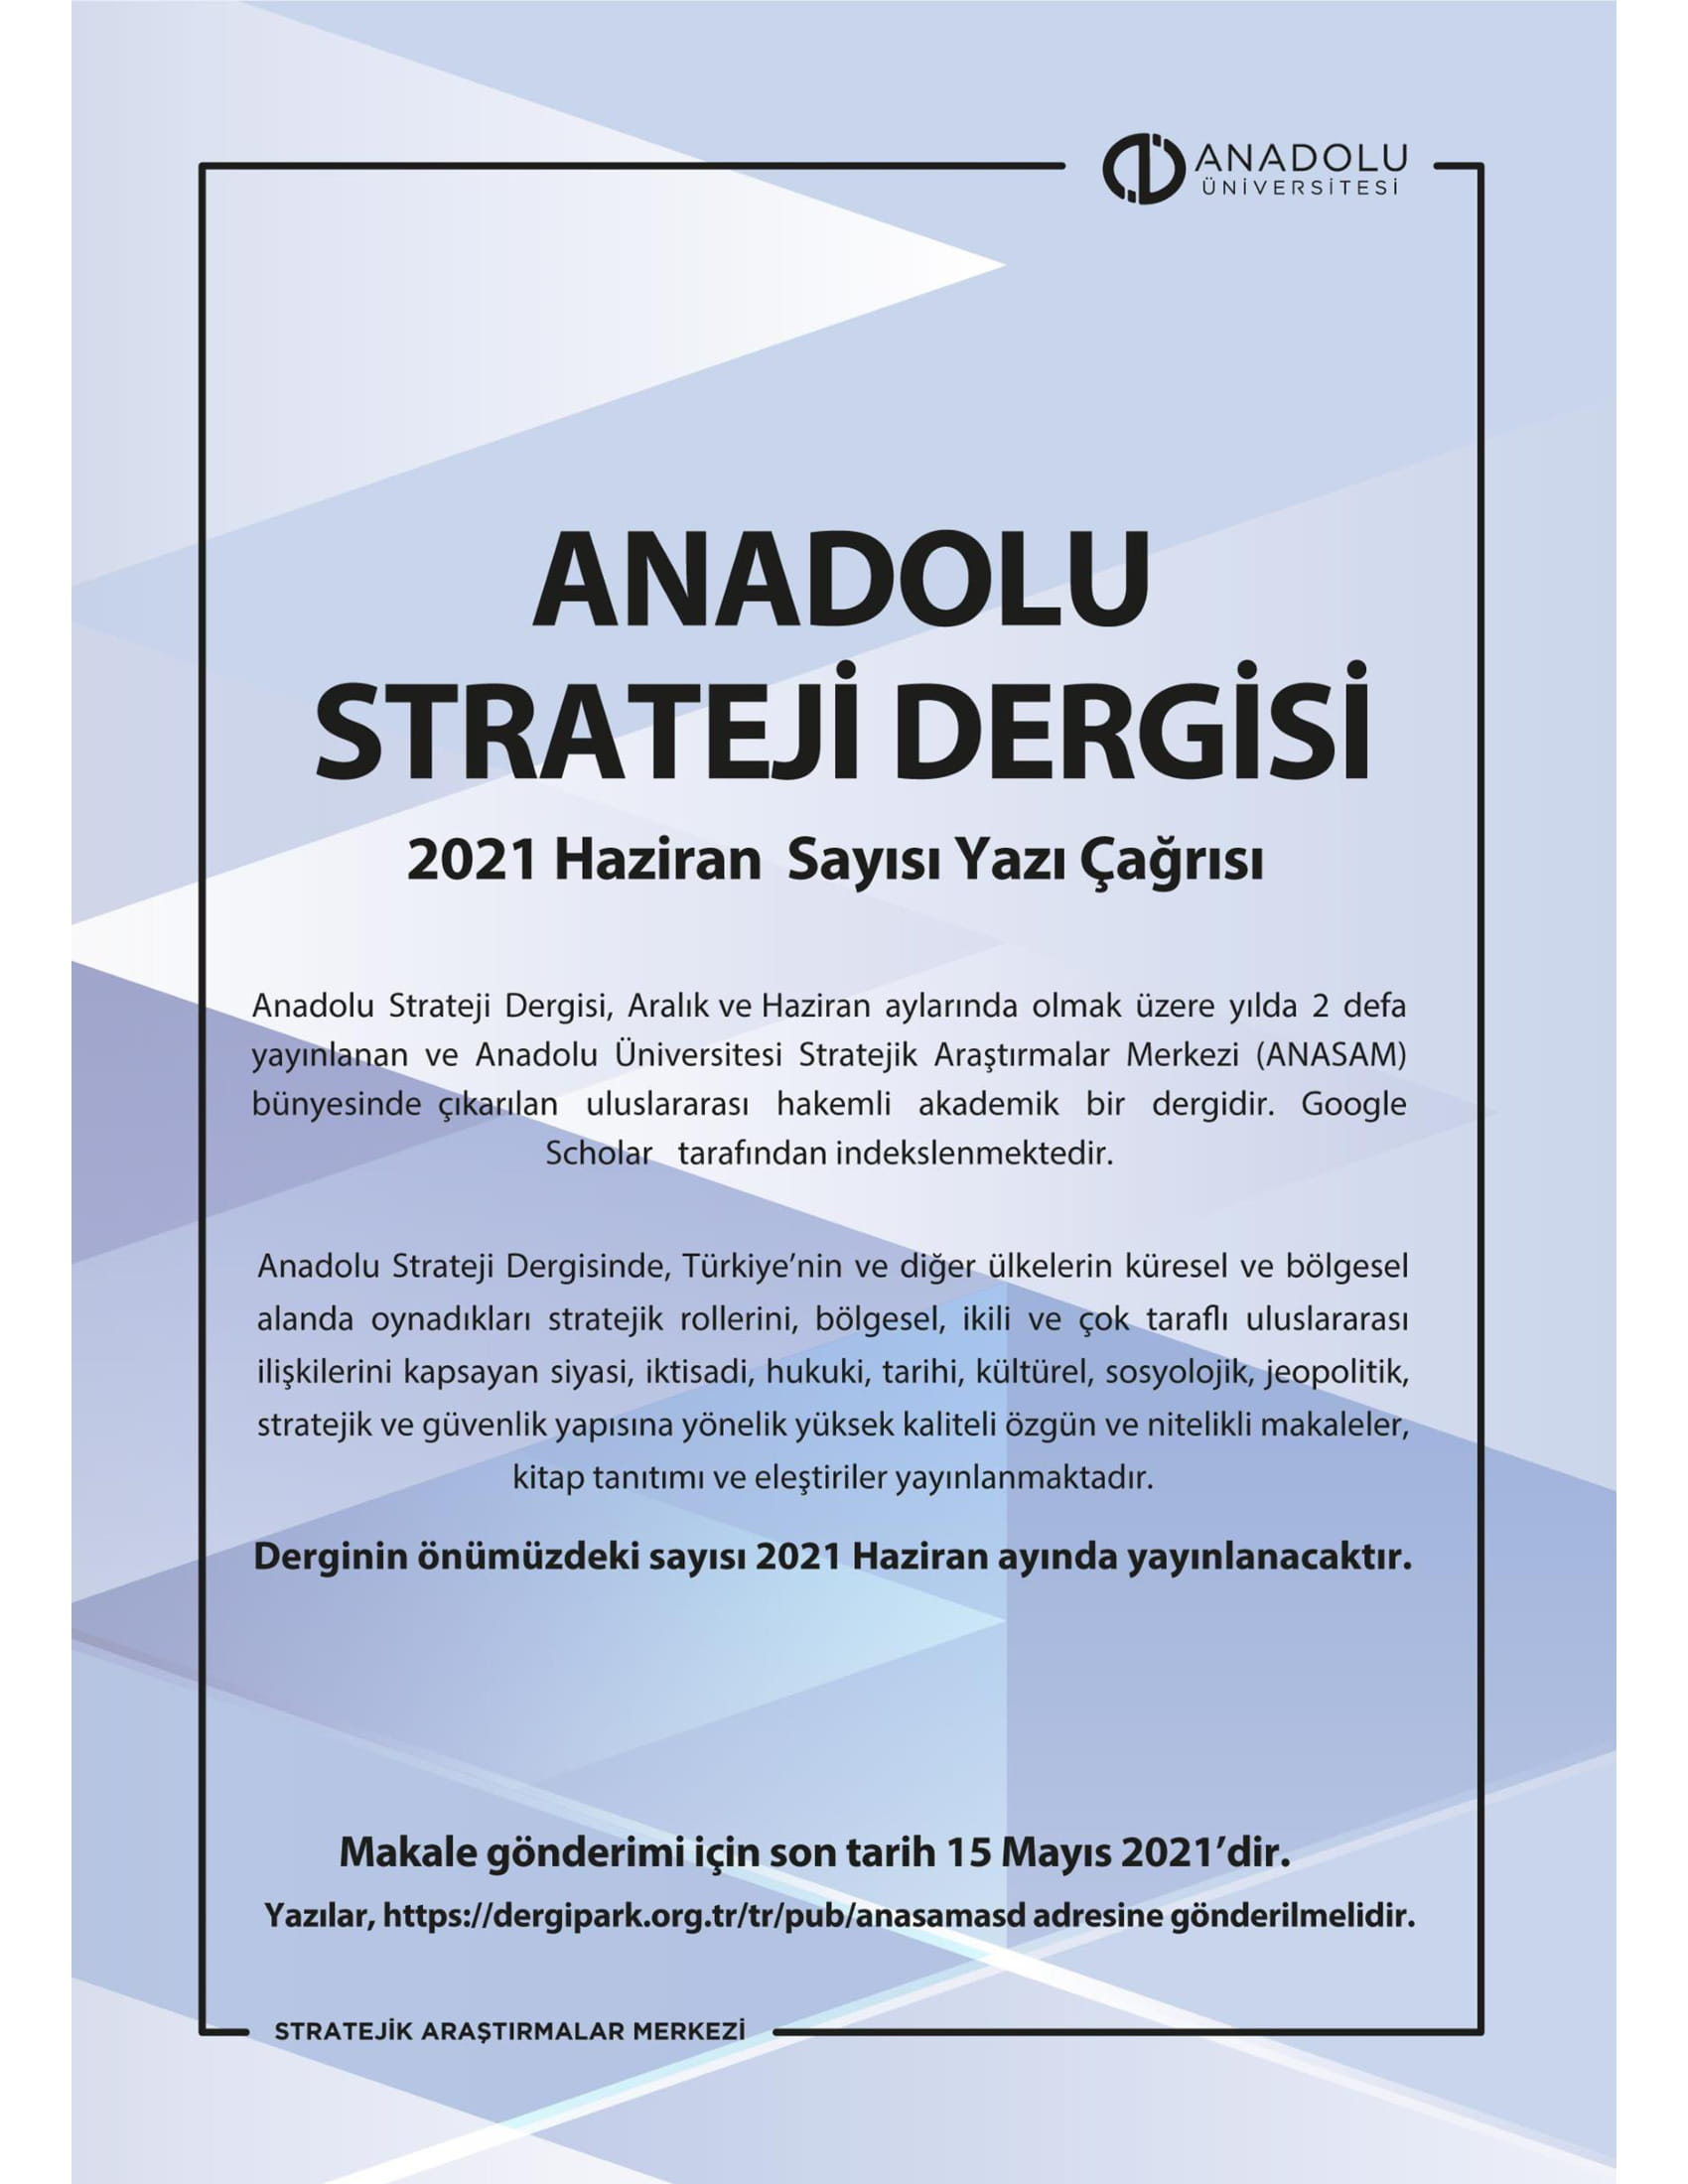 https://www.omu.edu.tr/sites/default/files/kamuduyurular/Anadolu%20Strateji%20Dergisi%20Yaz%C4%B1%20%C3%87a%C4%9Fr%C4%B1s%C4%B1/anadolu_strateji_dergisi_2021_haziran_sayisi_yazi_cagrisi-1.jpg